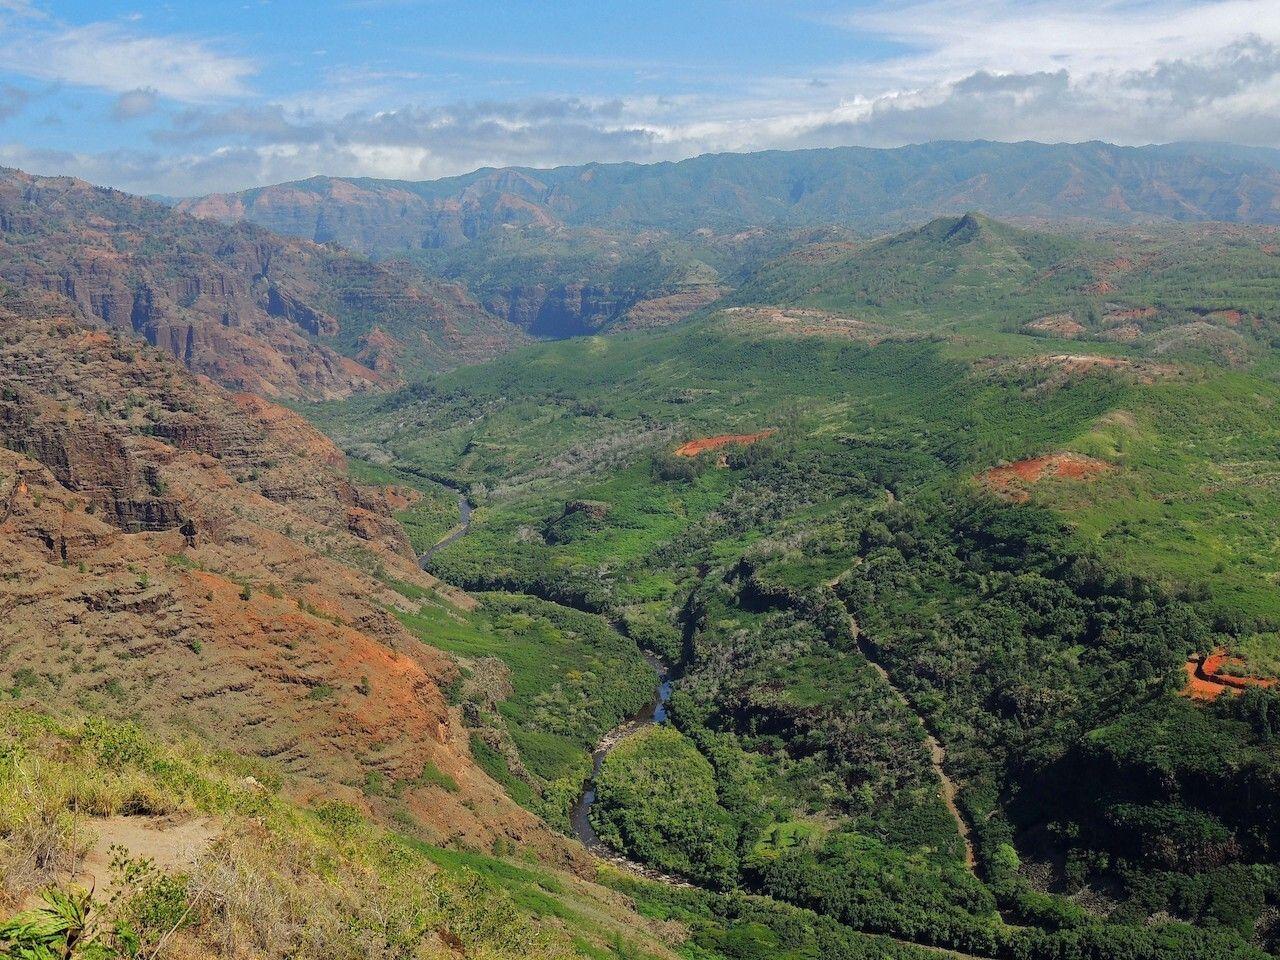 waimea canyon from highway 50 in kauai, hawaii